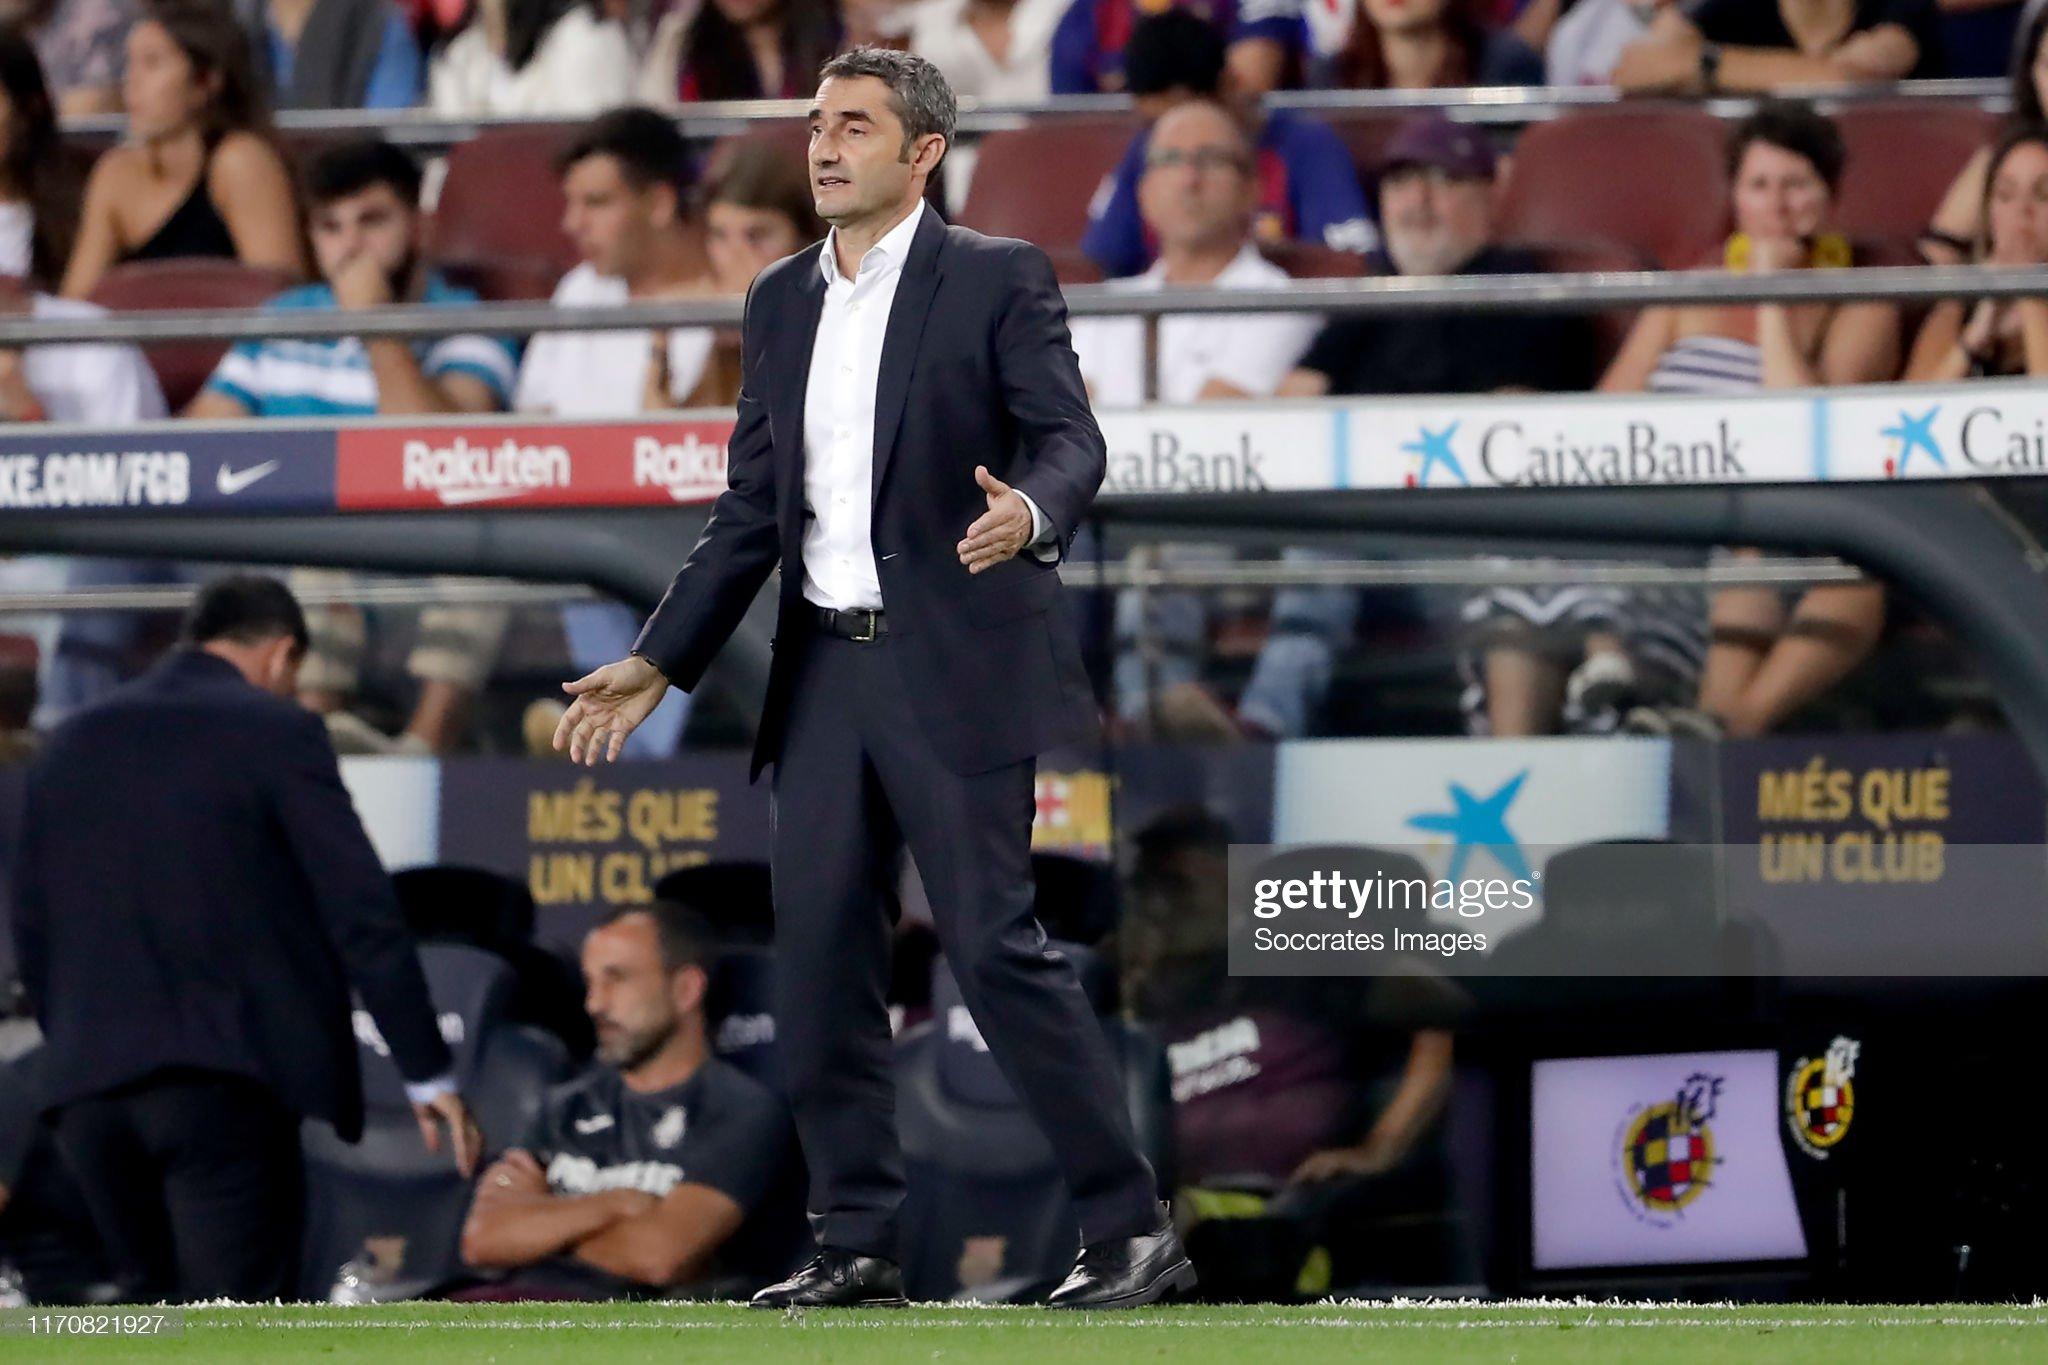 صور مباراة : برشلونة - فياريال 2-1 ( 24-09-2019 )  Coach-ernesto-valverde-of-fc-barcelona-during-the-la-liga-santander-picture-id1170821927?s=2048x2048